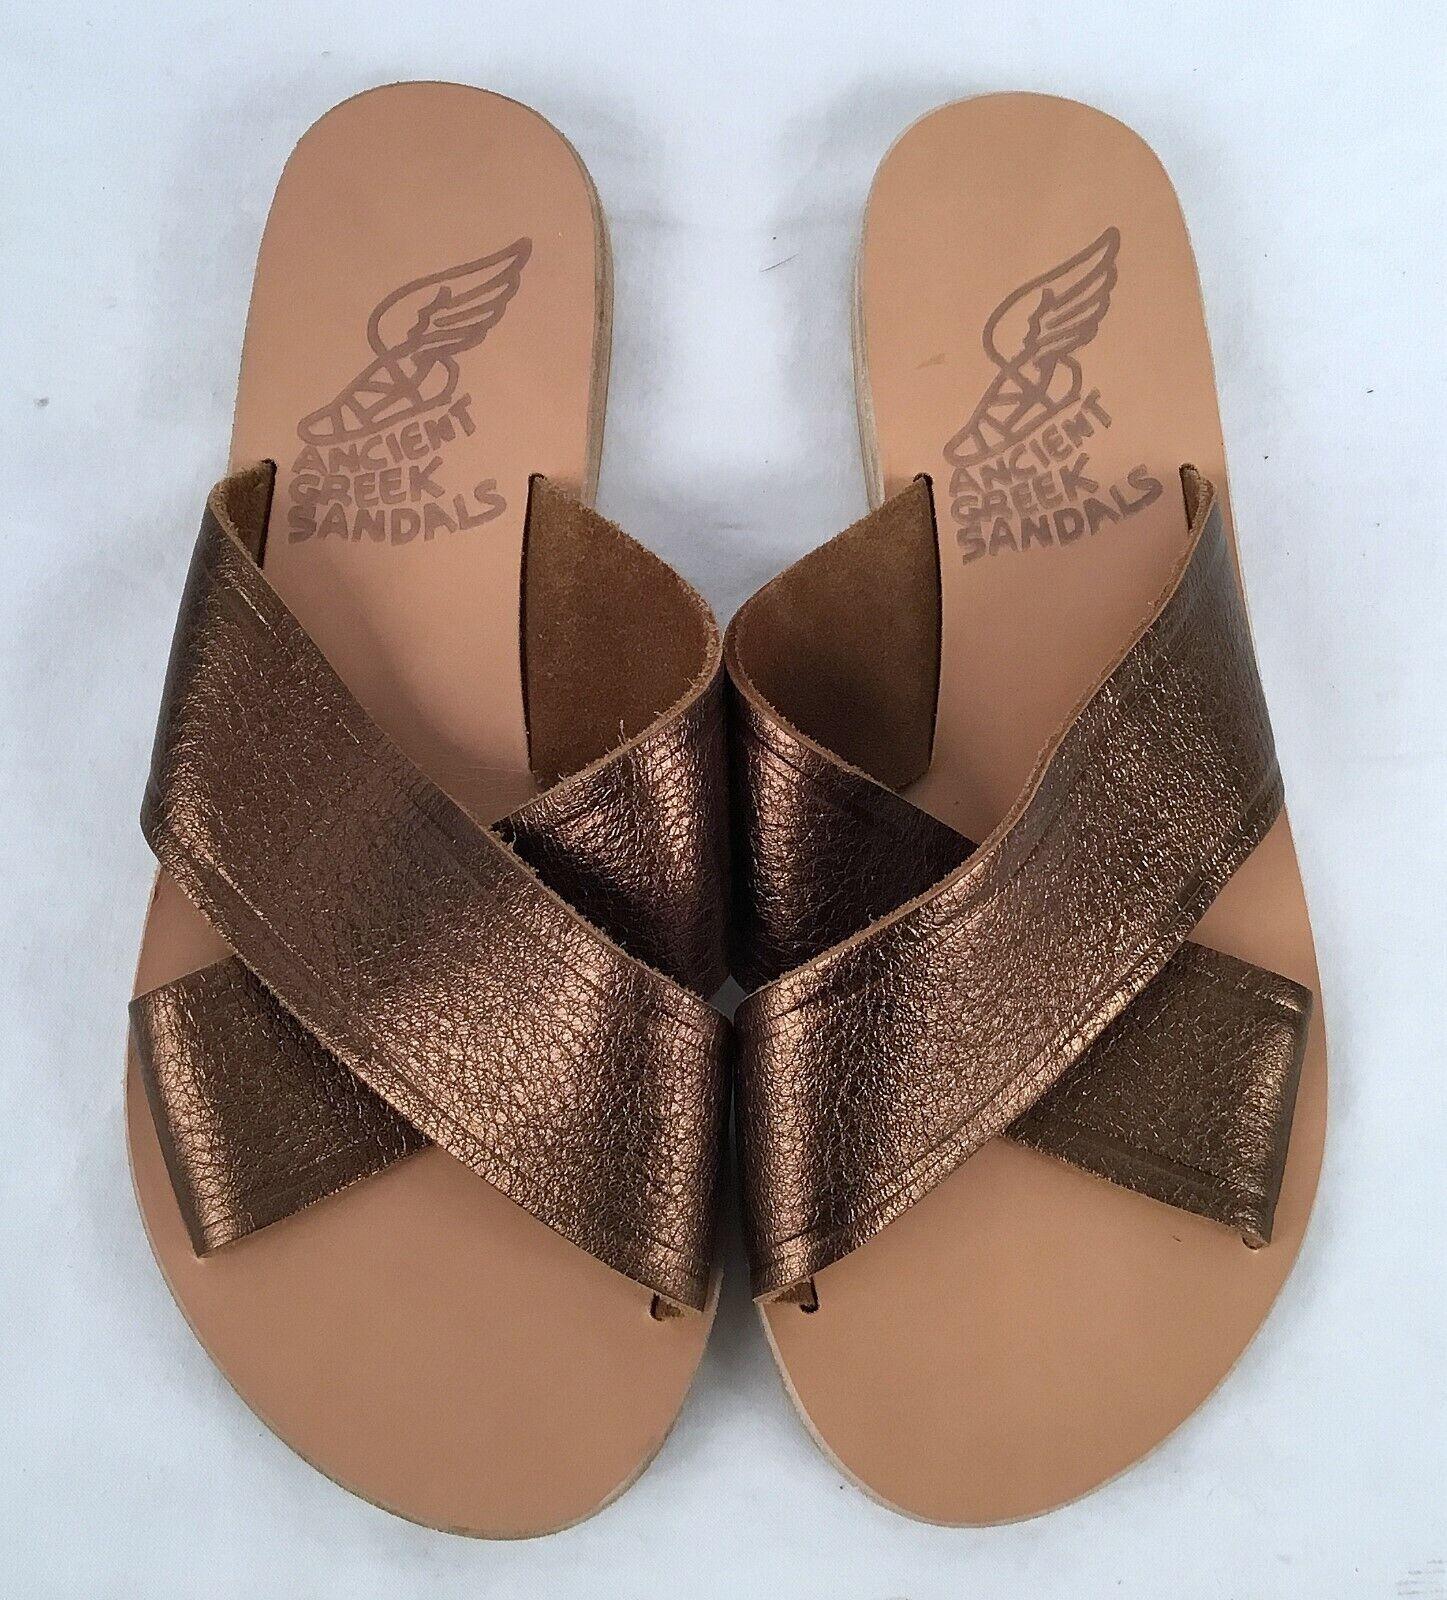 nyA antika grekiska sandaler -'Thais Bronze läder -Storlek US 5   EU 36 - (P11)